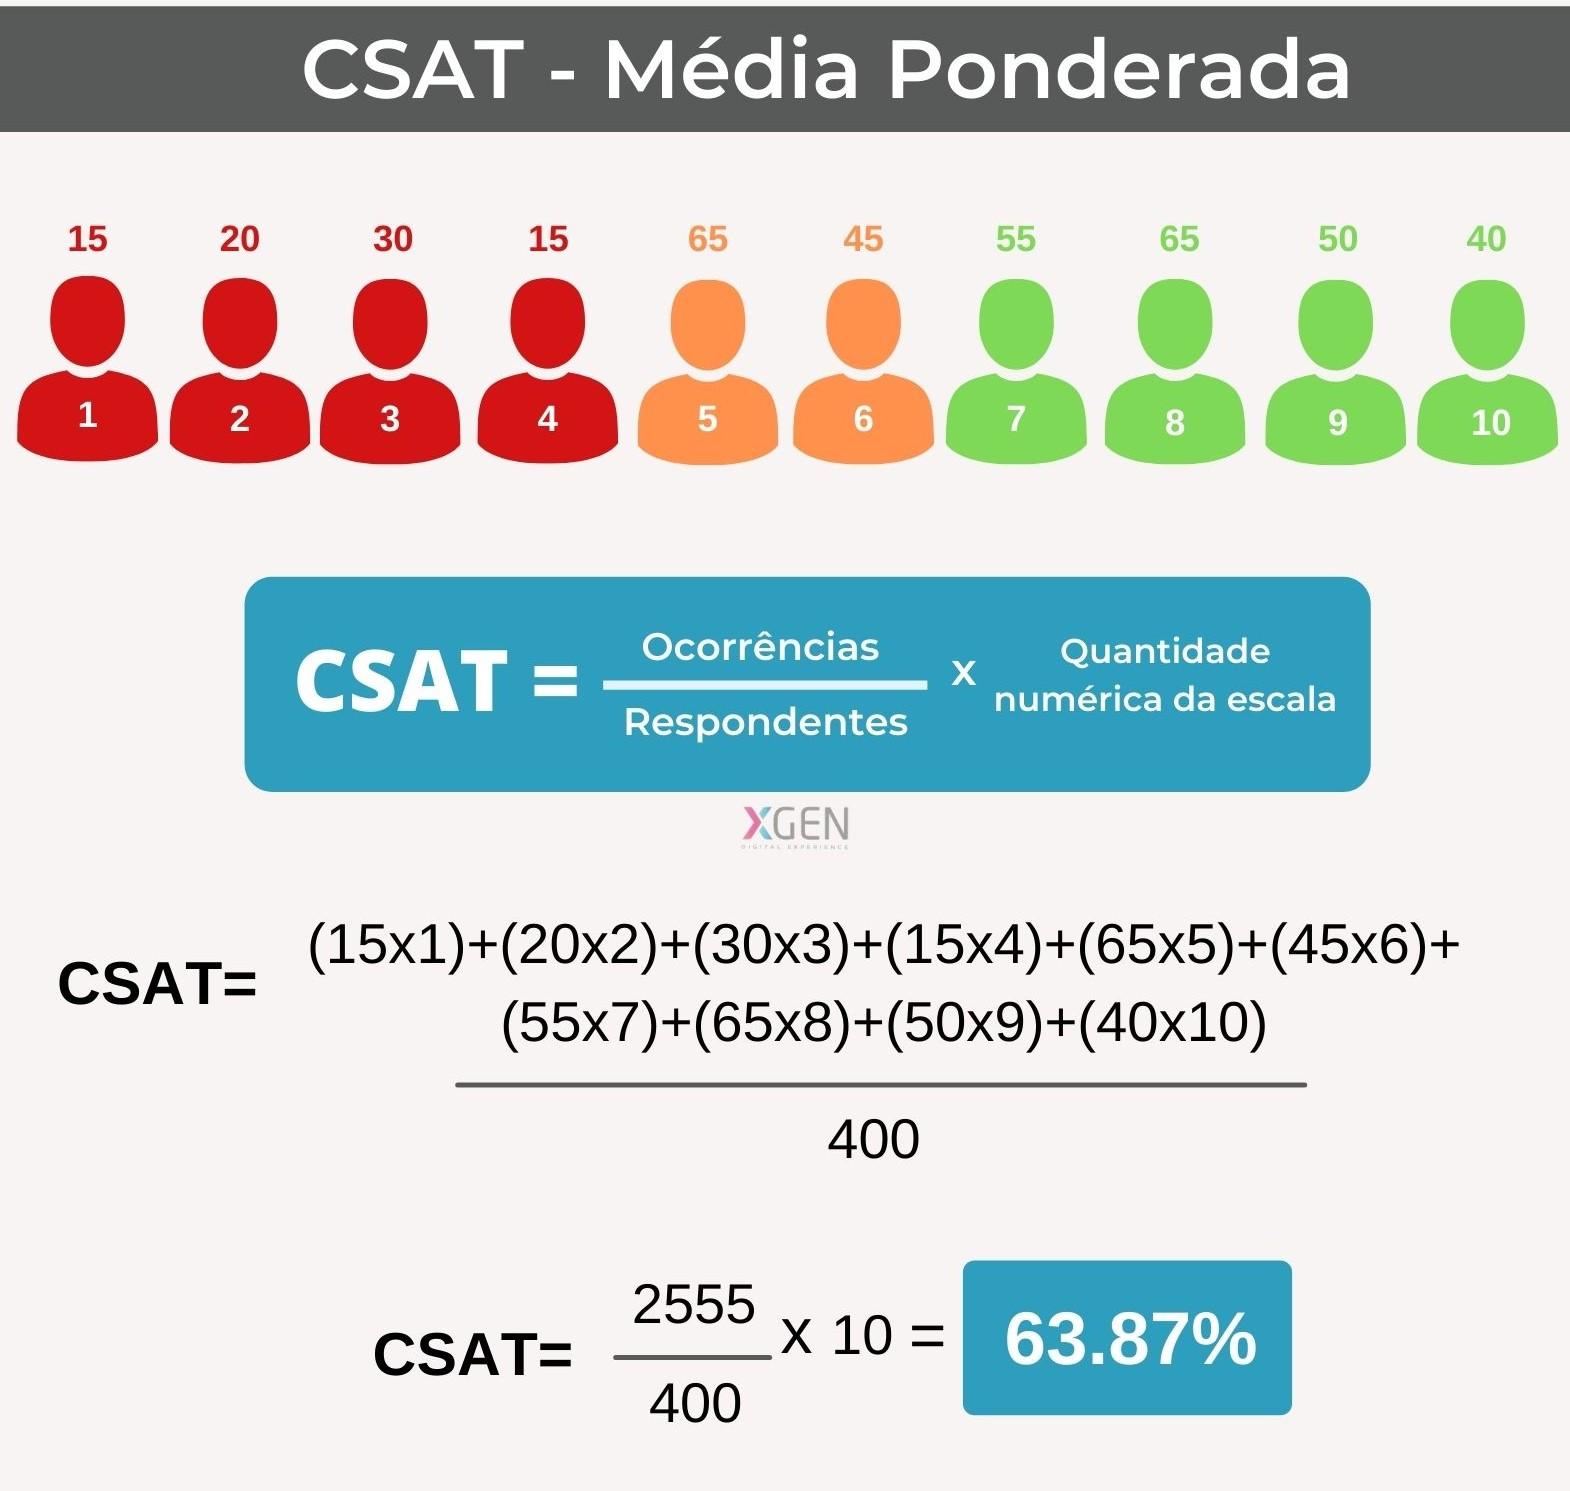 CSAT - Customer Satisfaction Score - Como calcular